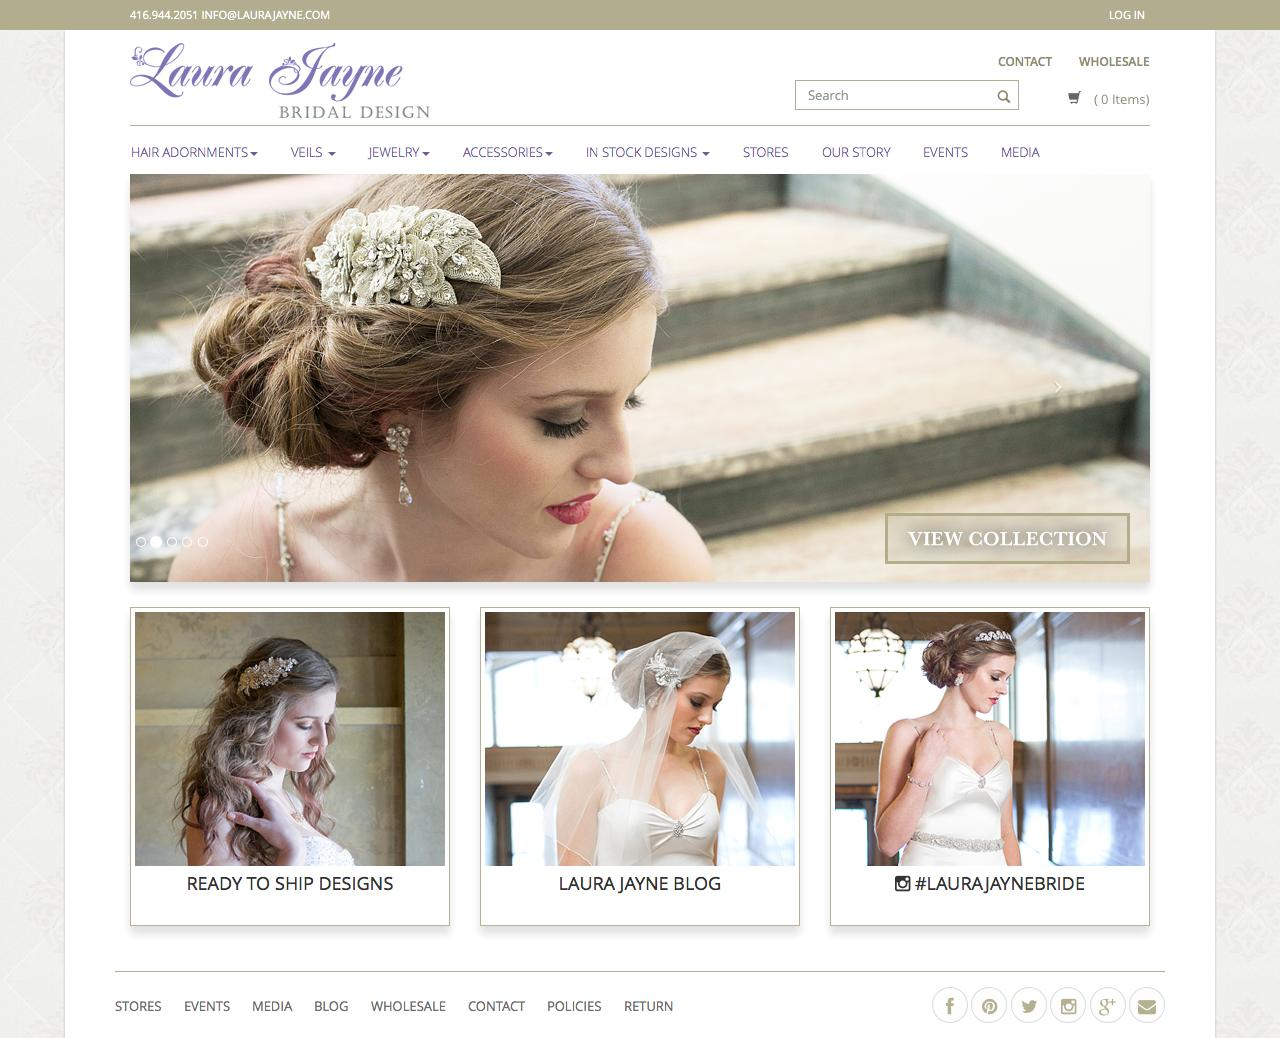 Screenshot of laurajayne.com - Bridal Hair Adornments, Veils, Accessories, Jewelry  - Laura Jayne - captured July 27, 2015